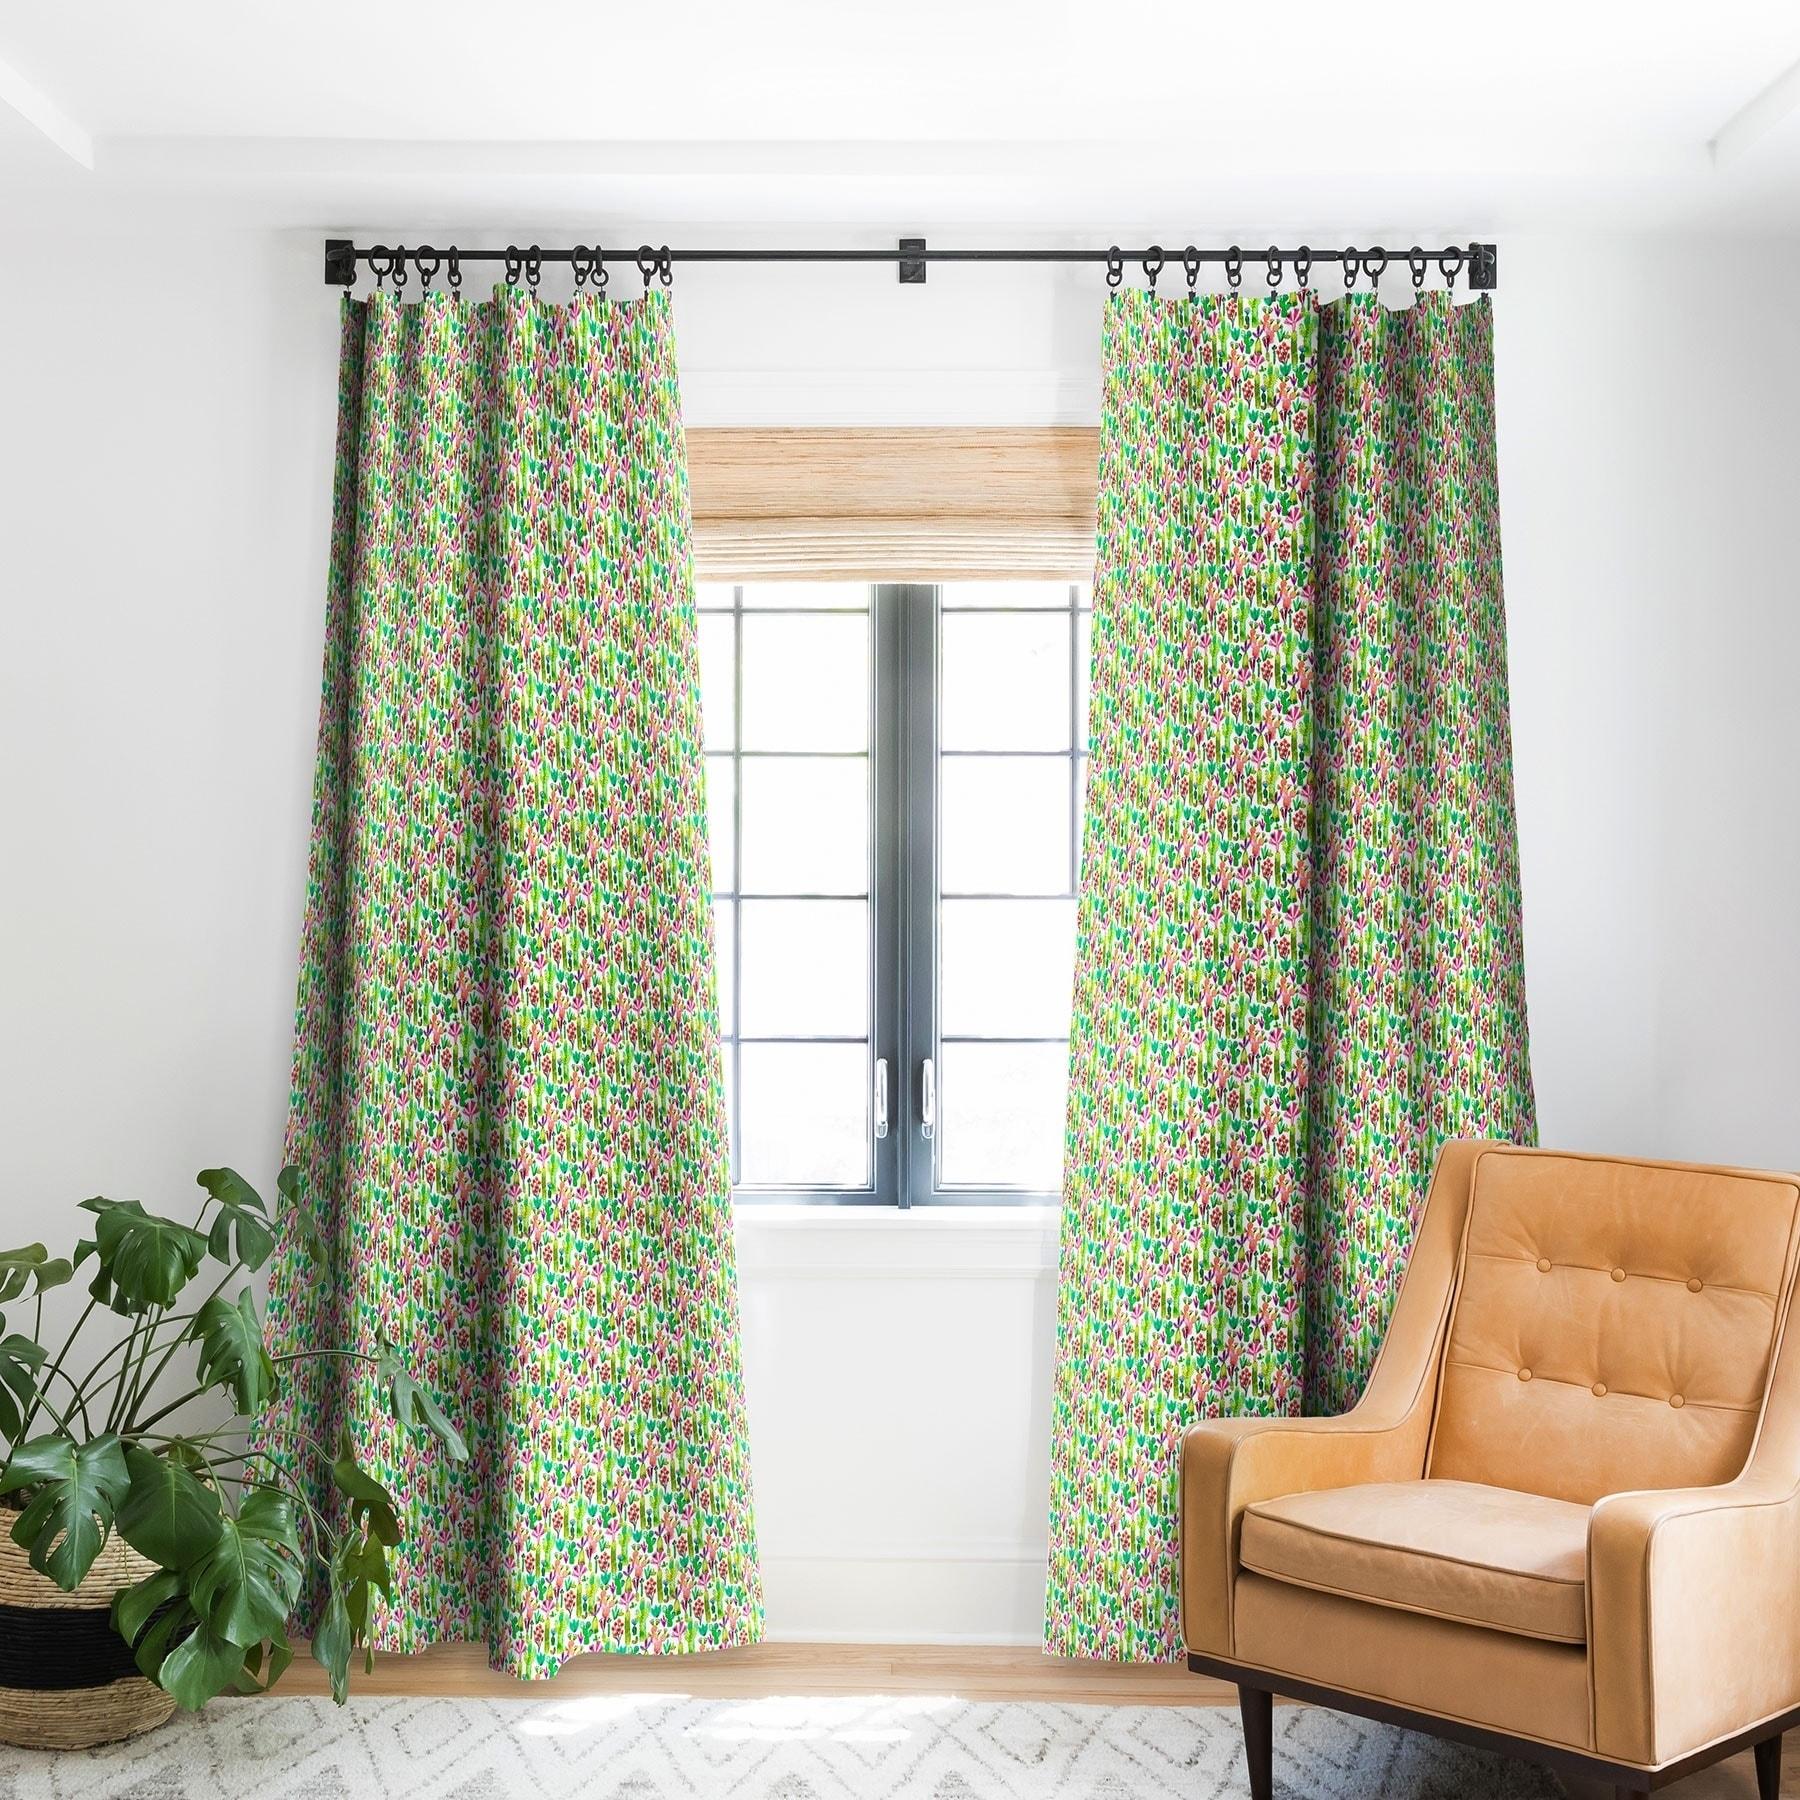 Ninola Design Cute And Green Cacti Garden Plants Blackout Curtain Panel On Sale Overstock 22046631